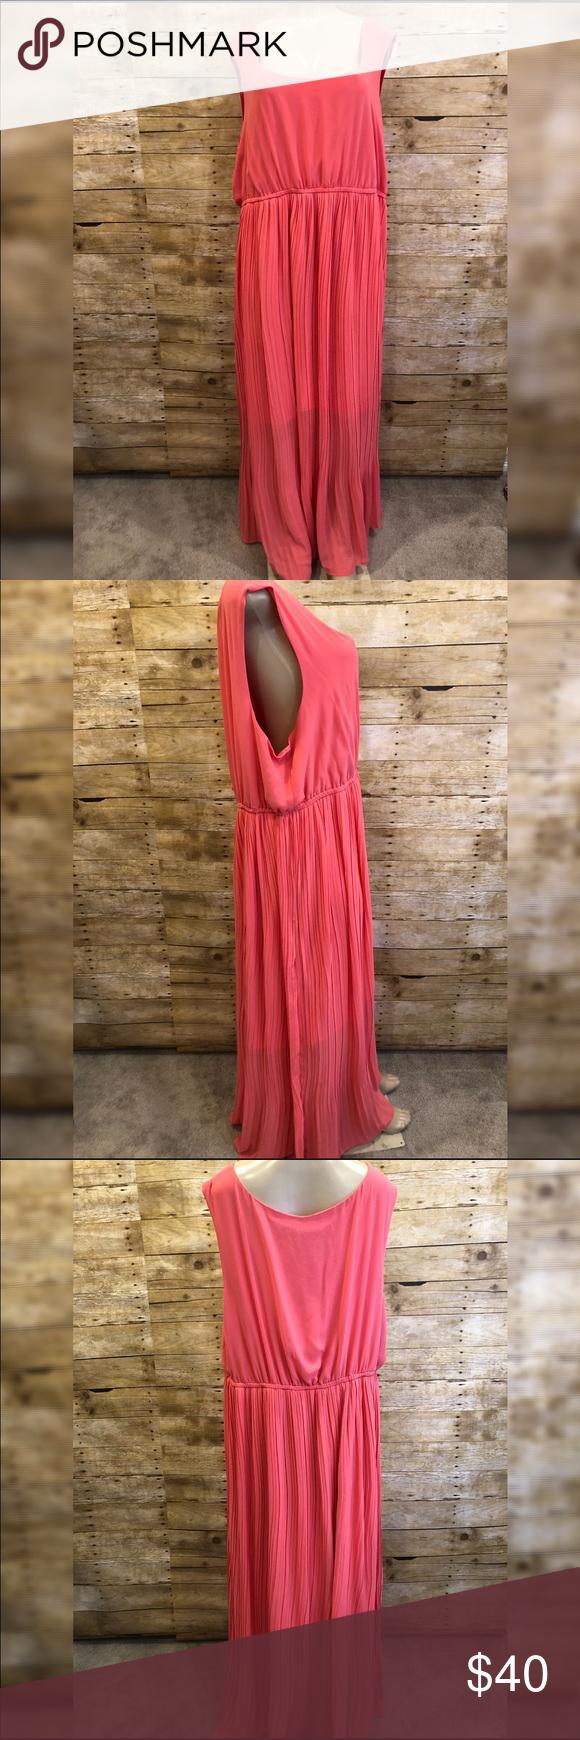 Torrid Coral Sleeveless Maxi Dress 4x Sleeveless Maxi Dress Maxi Dress Dresses [ 1740 x 580 Pixel ]